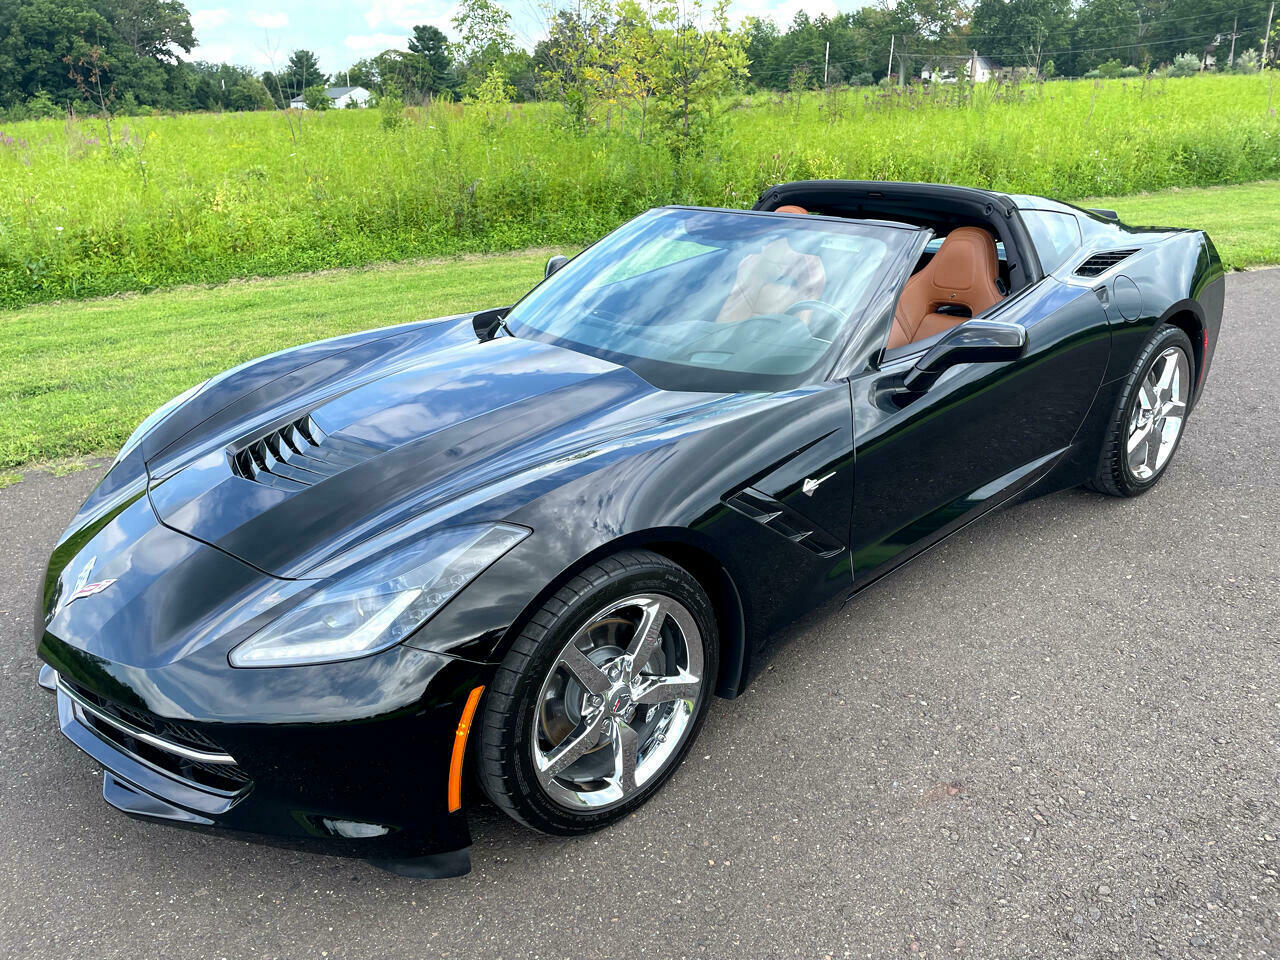 2014 Black Chevrolet Corvette Coupe 3LT | C7 Corvette Photo 1